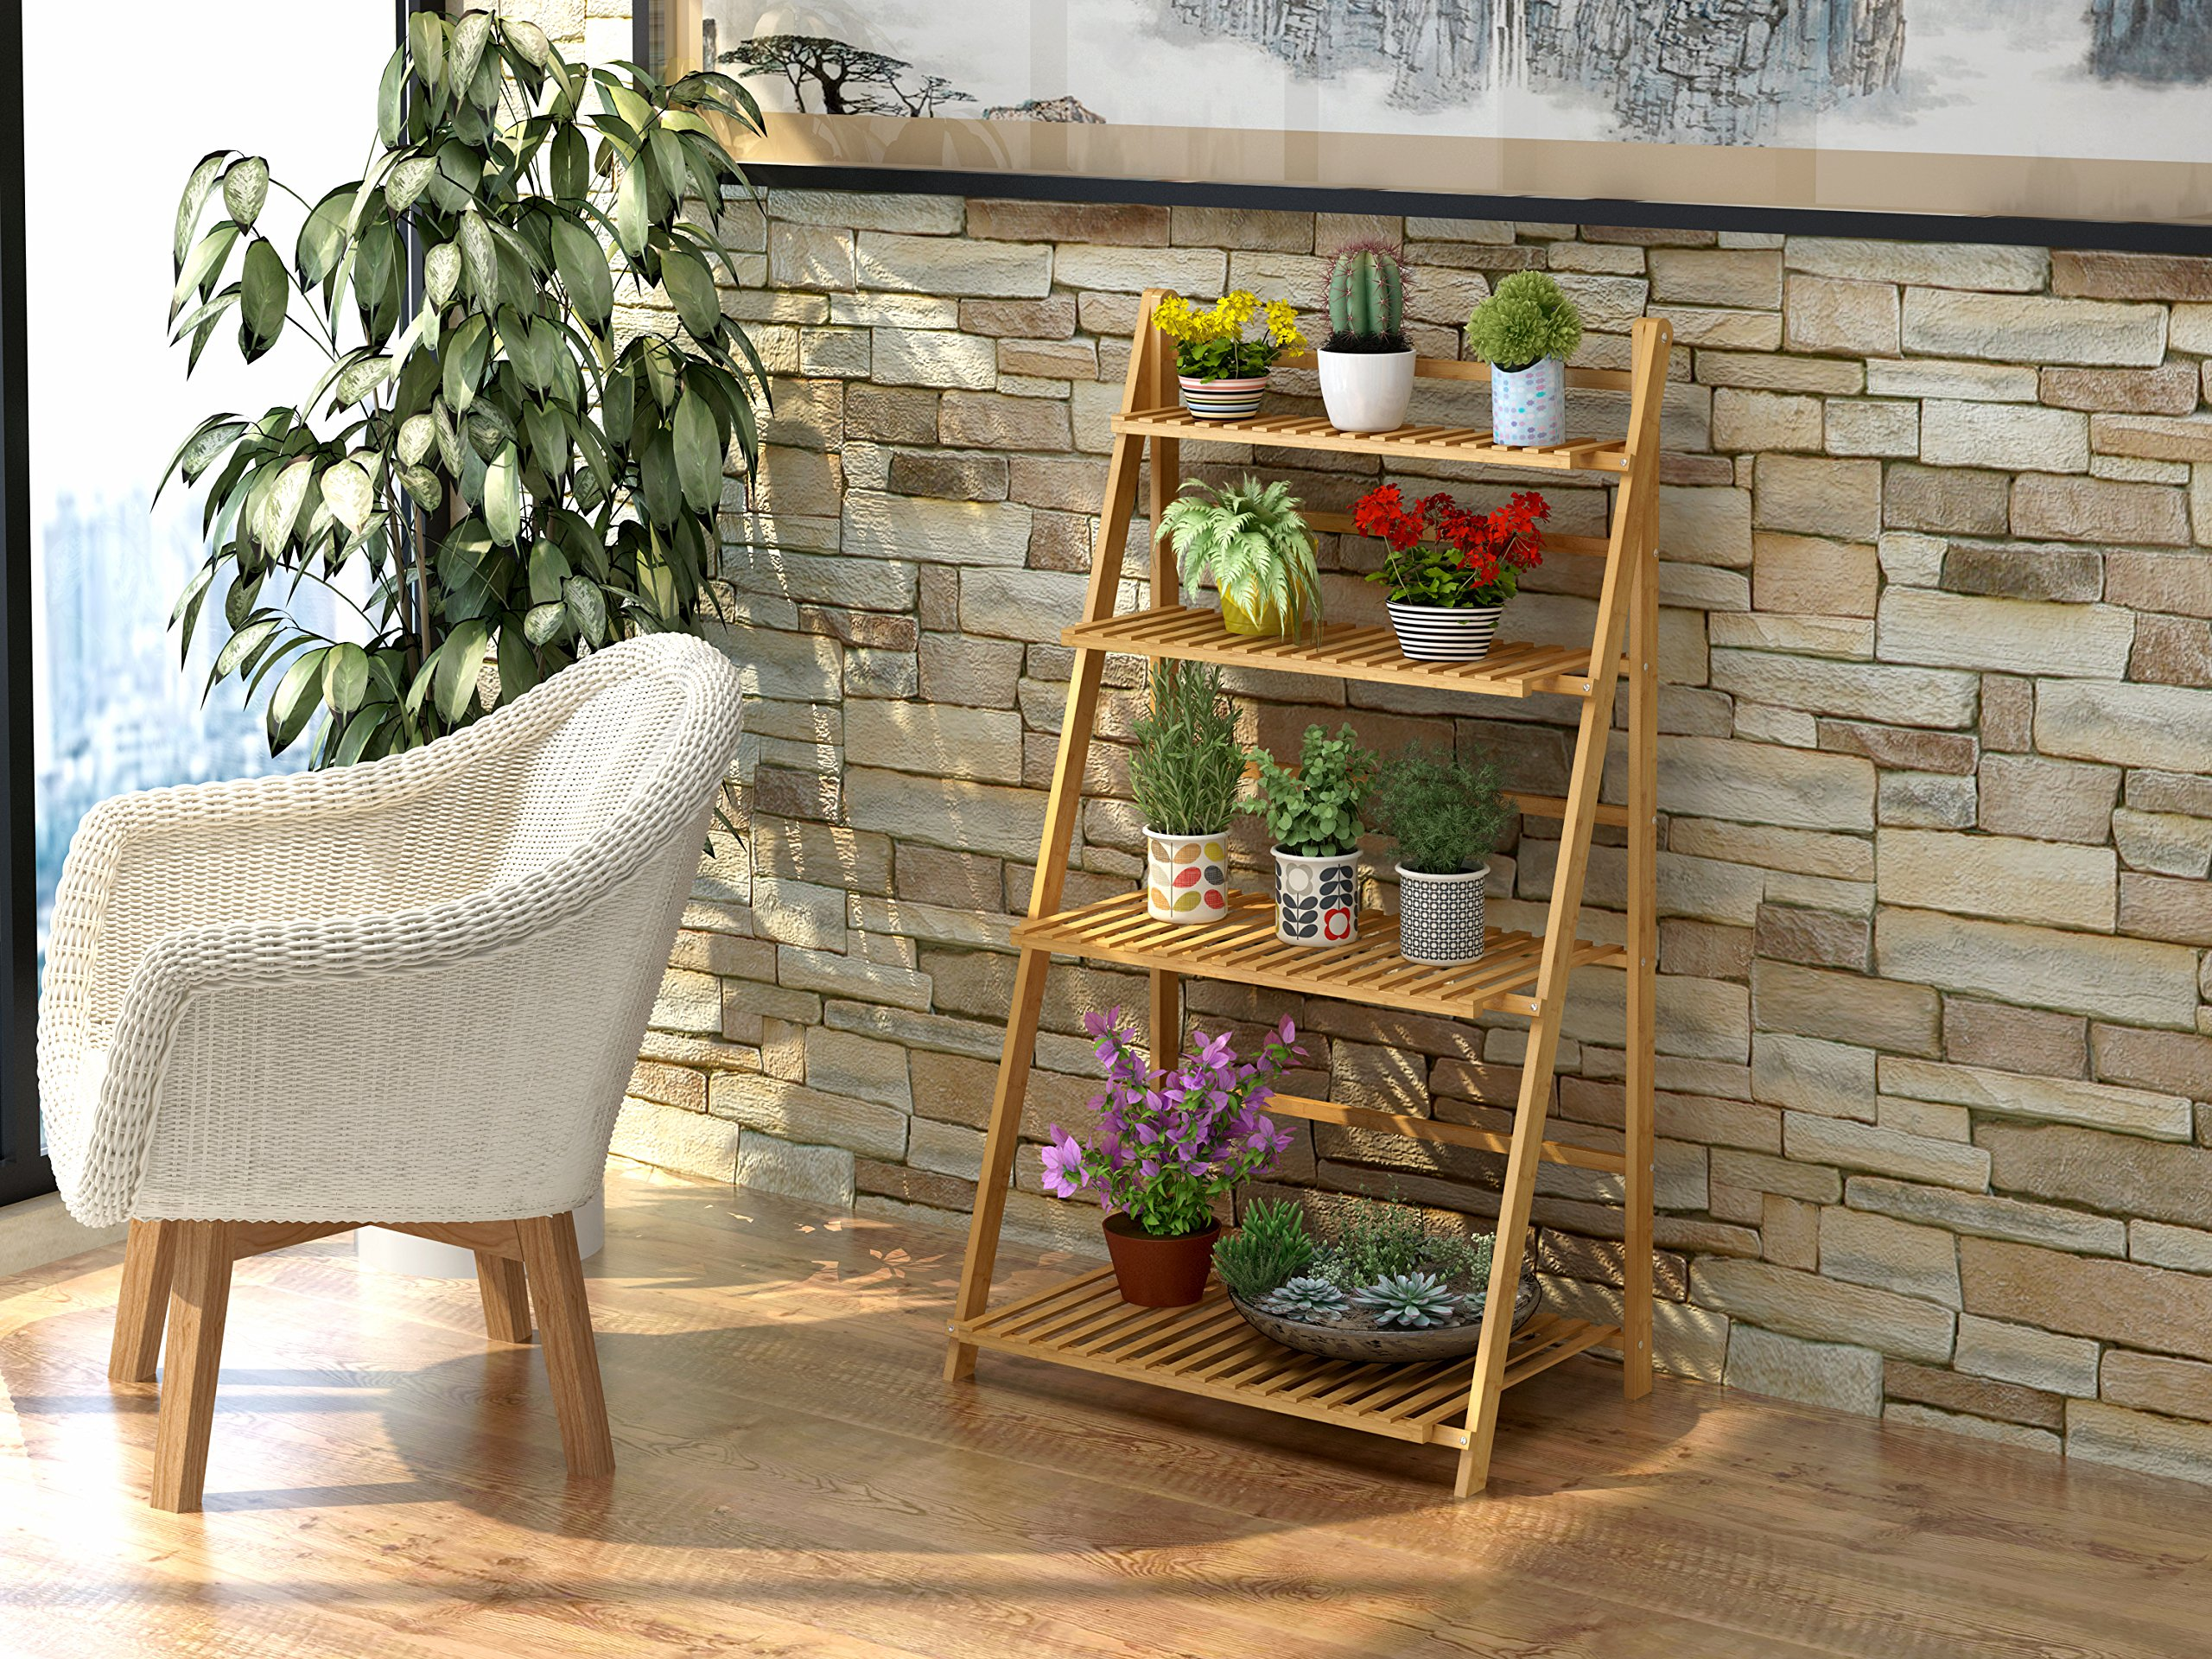 Polar Aurora Plant Flower Stand Rack Shelf 4-Tier Bamboo Foldable Pot Racks Planter Organizer Display Shelves by Polar Aurora